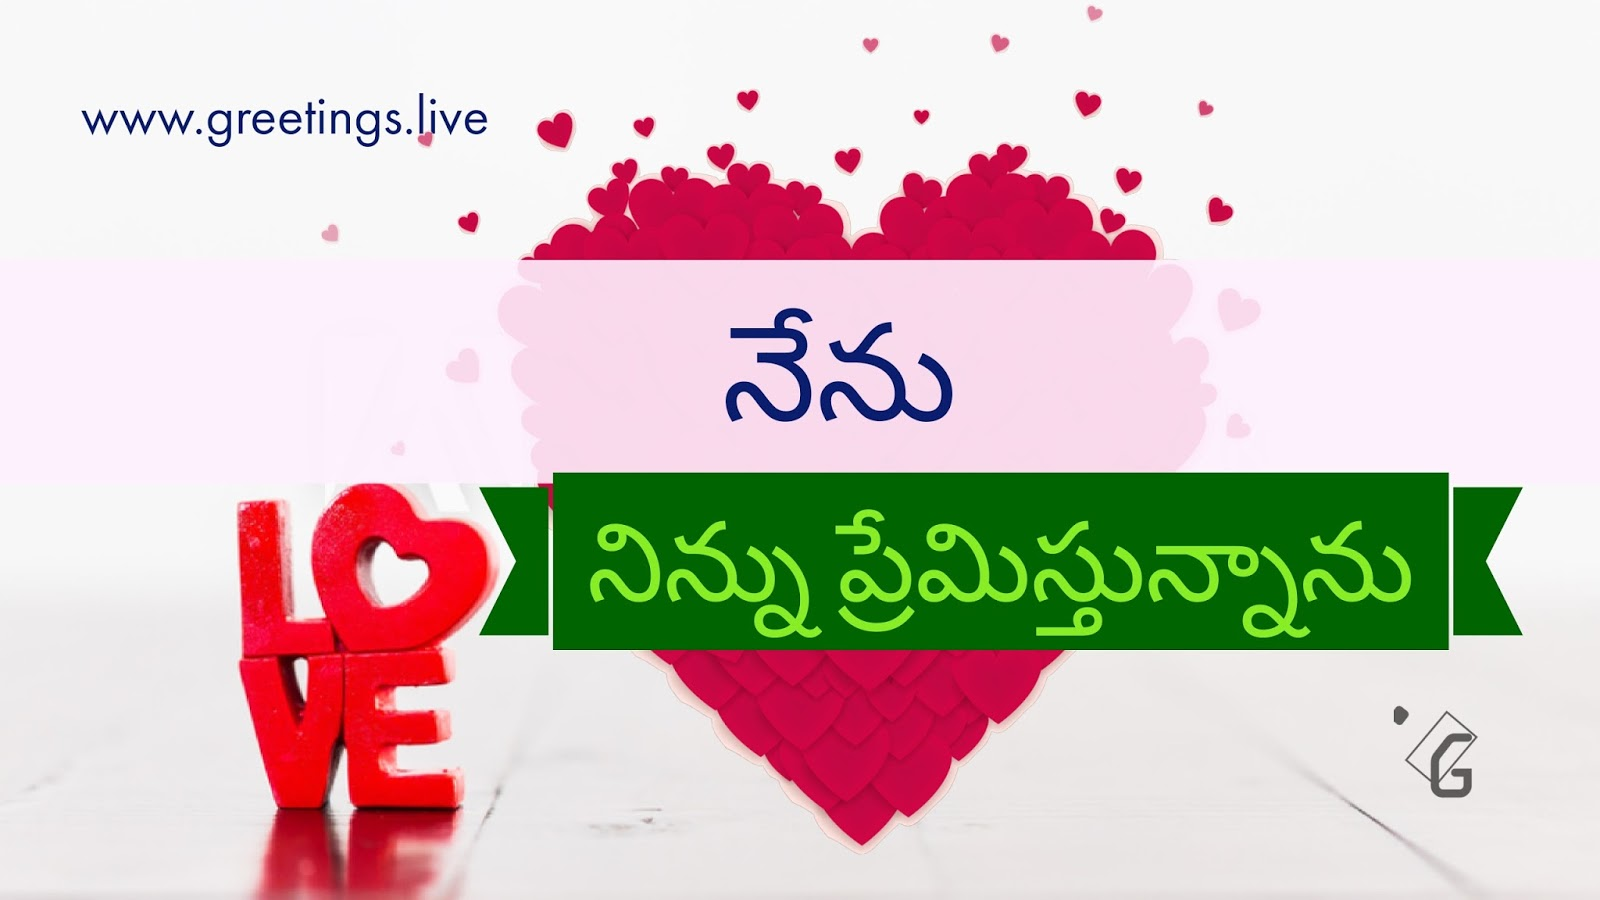 Greetingsve hd images love smile birthday wishes free download i love you nenu ninnu premisthunanu kristyandbryce Image collections